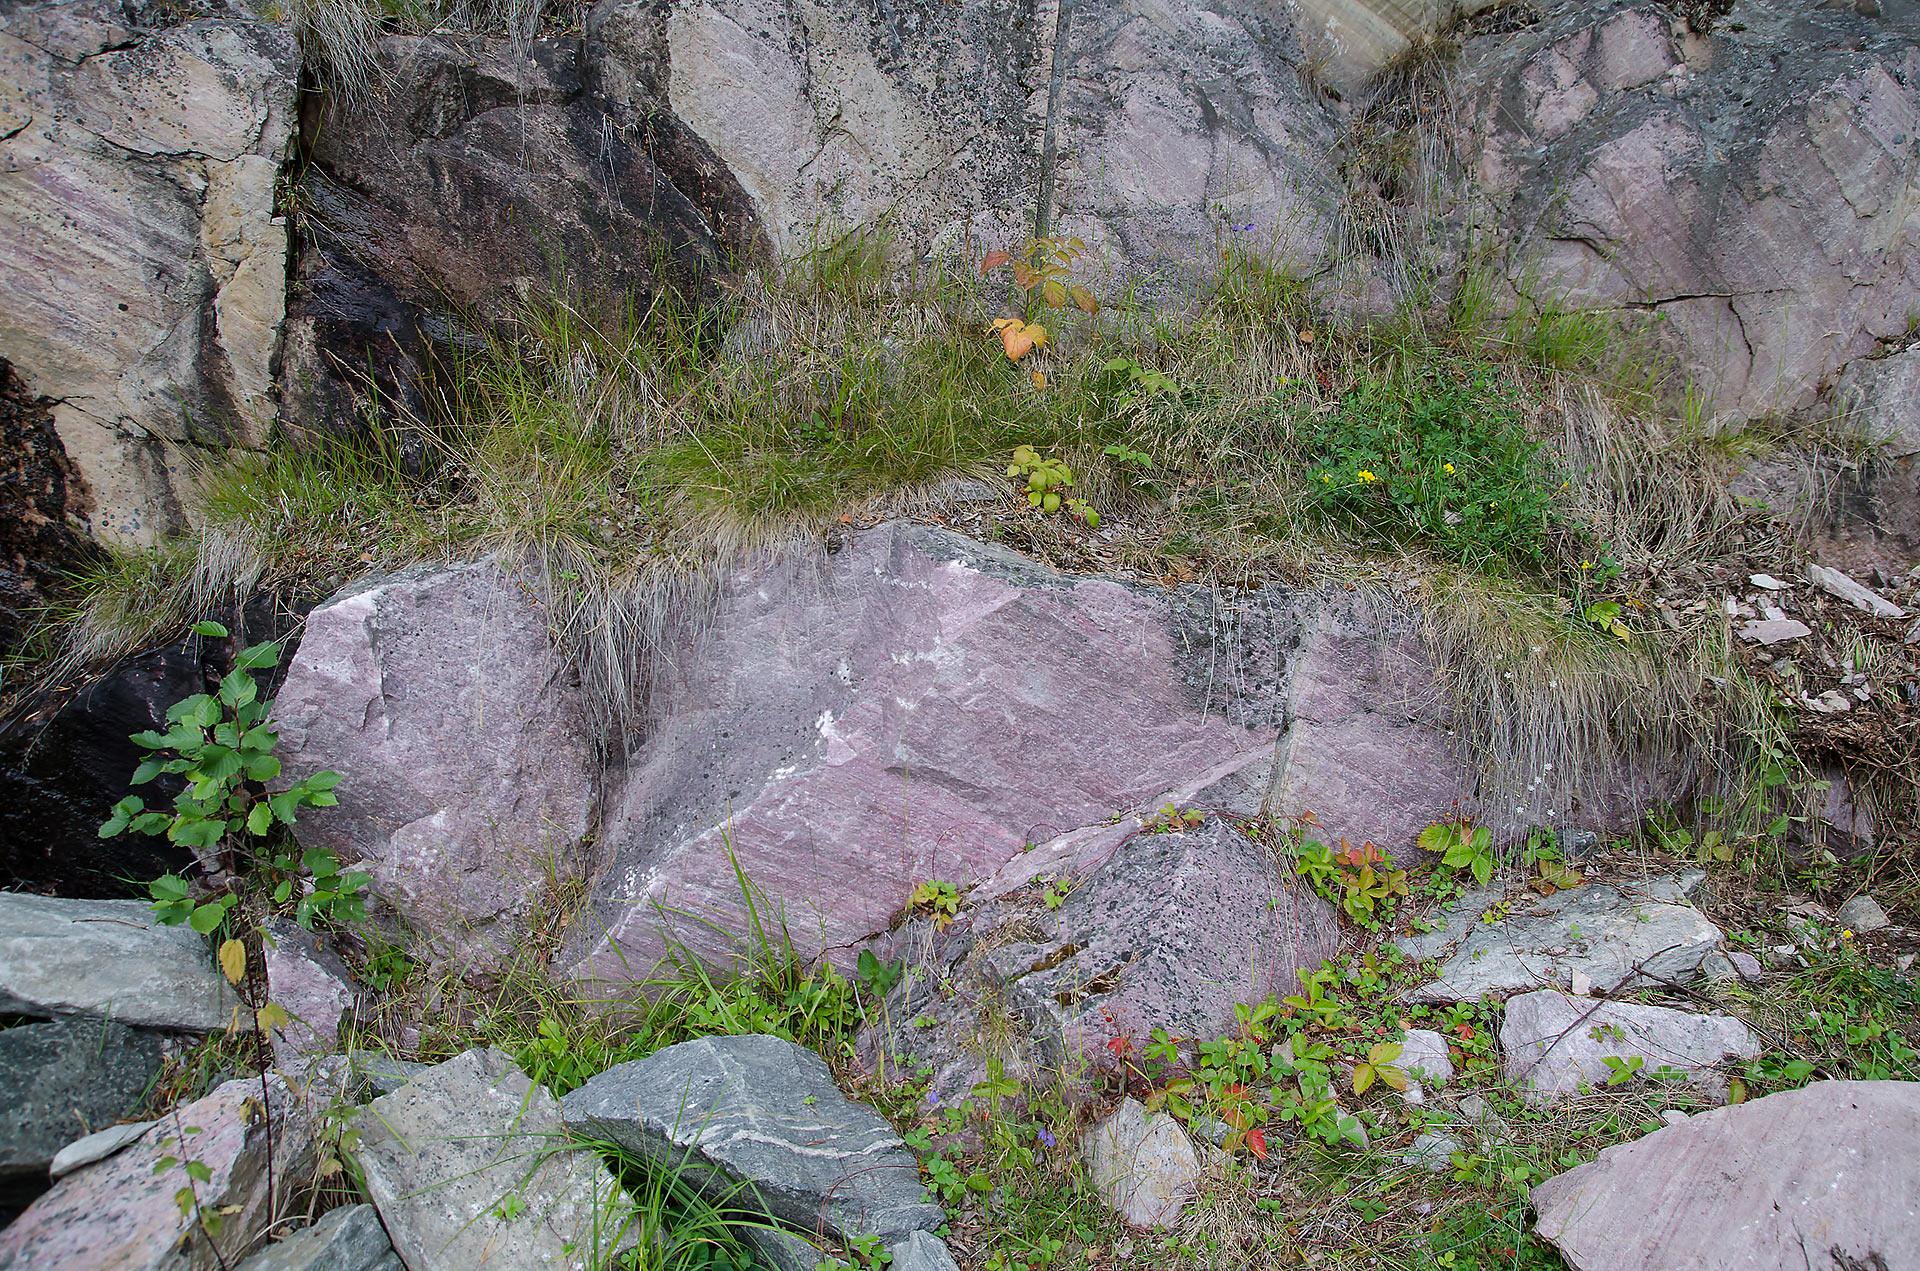 Søre Lia Quarry, Lom, Norsko